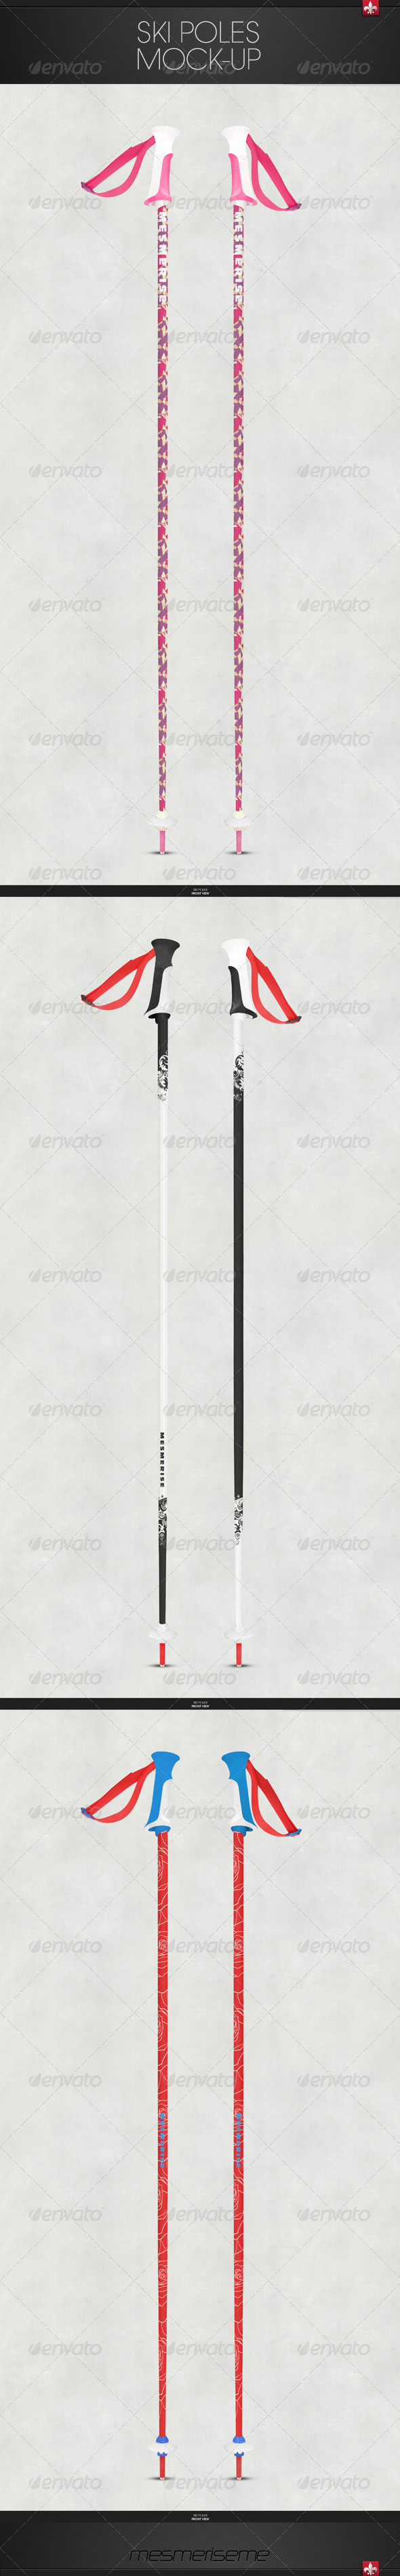 GraphicRiver Ski Poles Mock-up 6521491